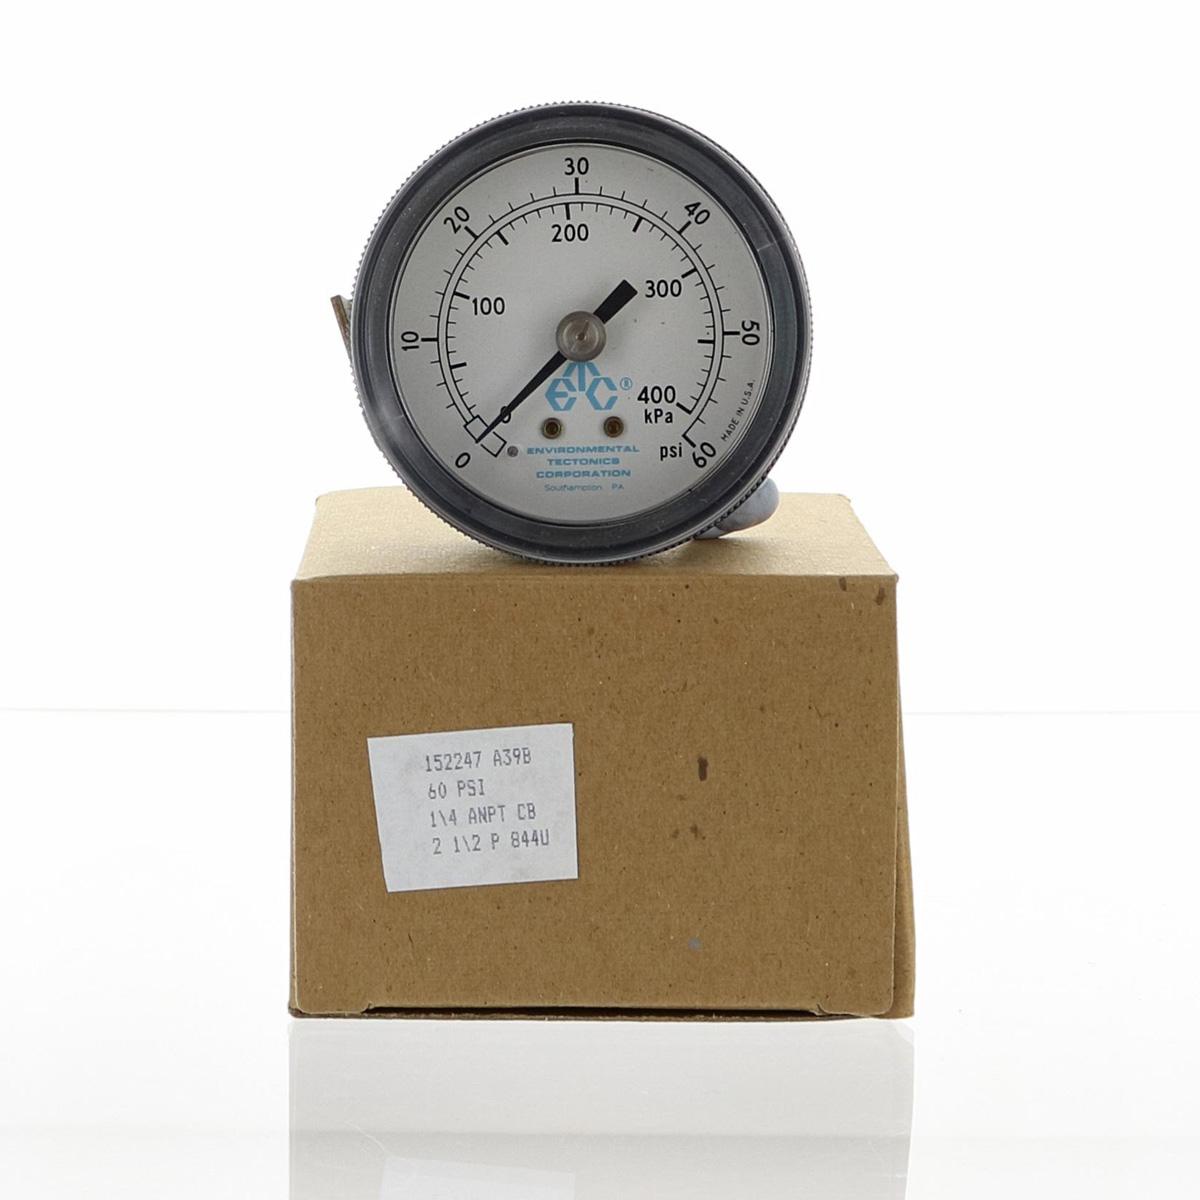 60 PSI 0-400 kPa 2.5